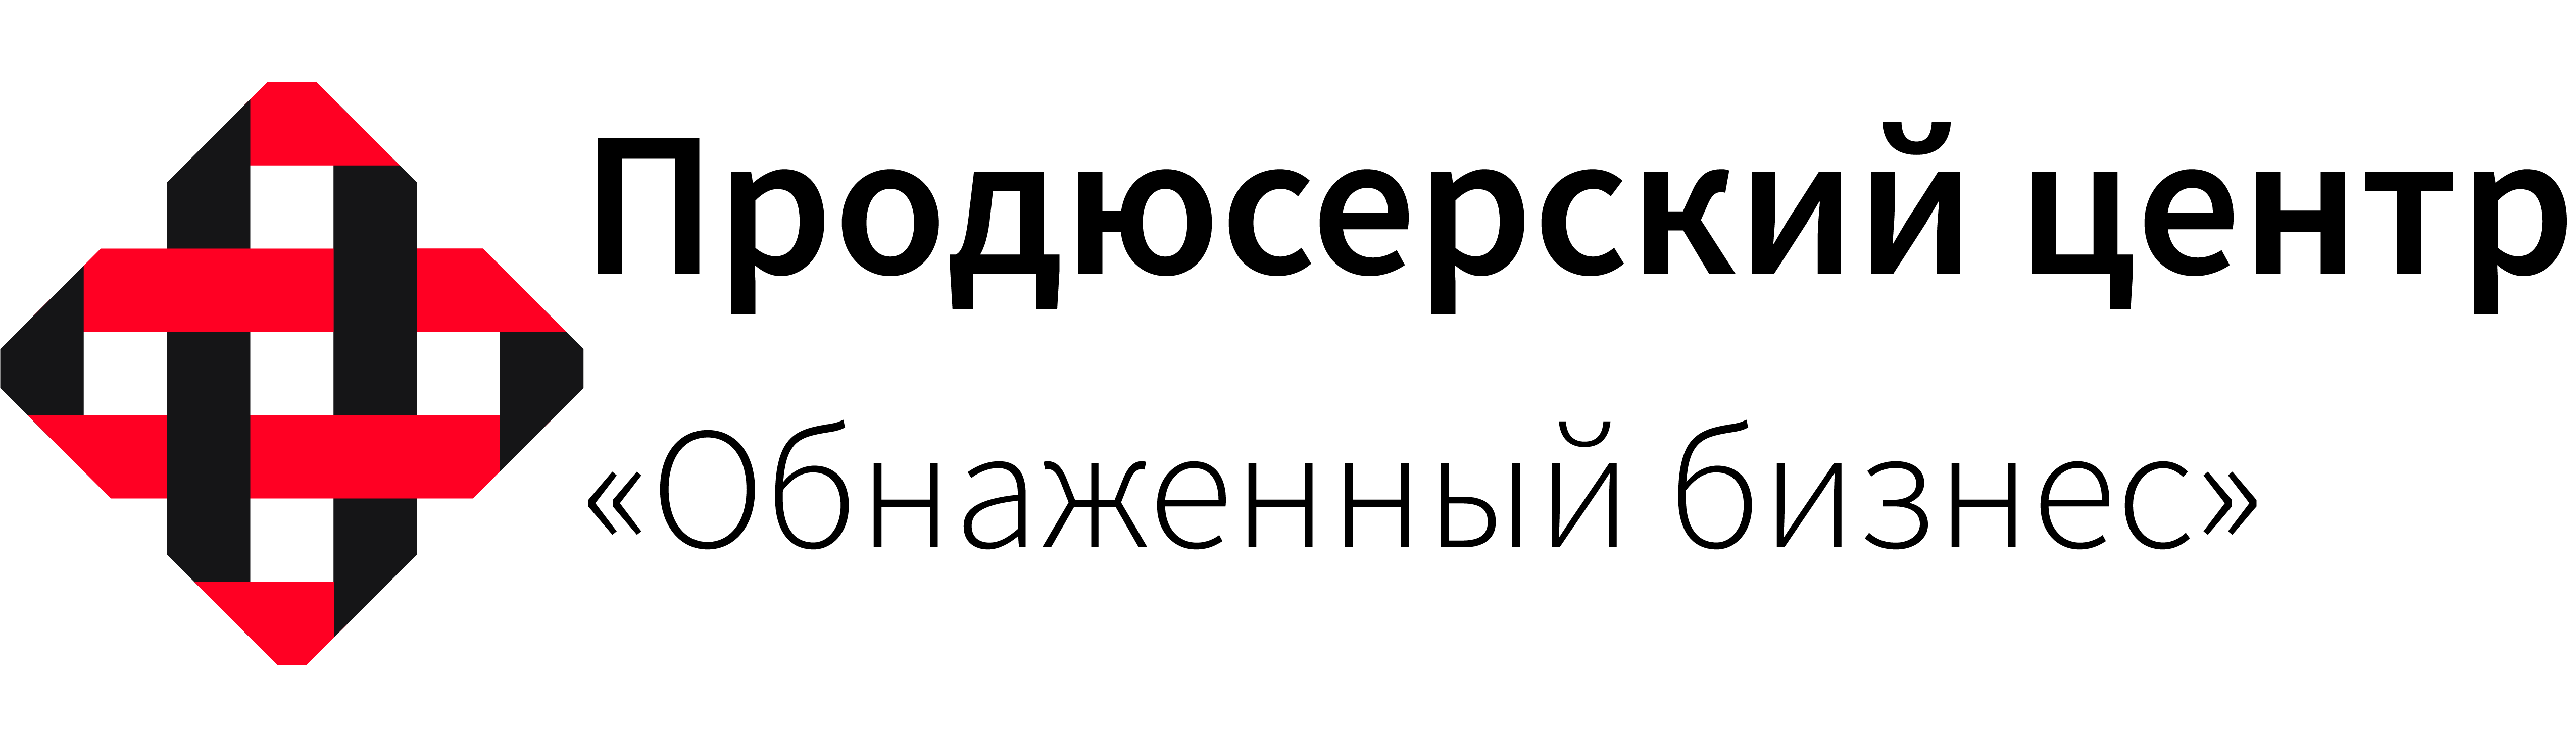 "Логотип для продюсерского центра ""Обнажённый бизнес"" фото f_0275b9d171f3d44c.png"